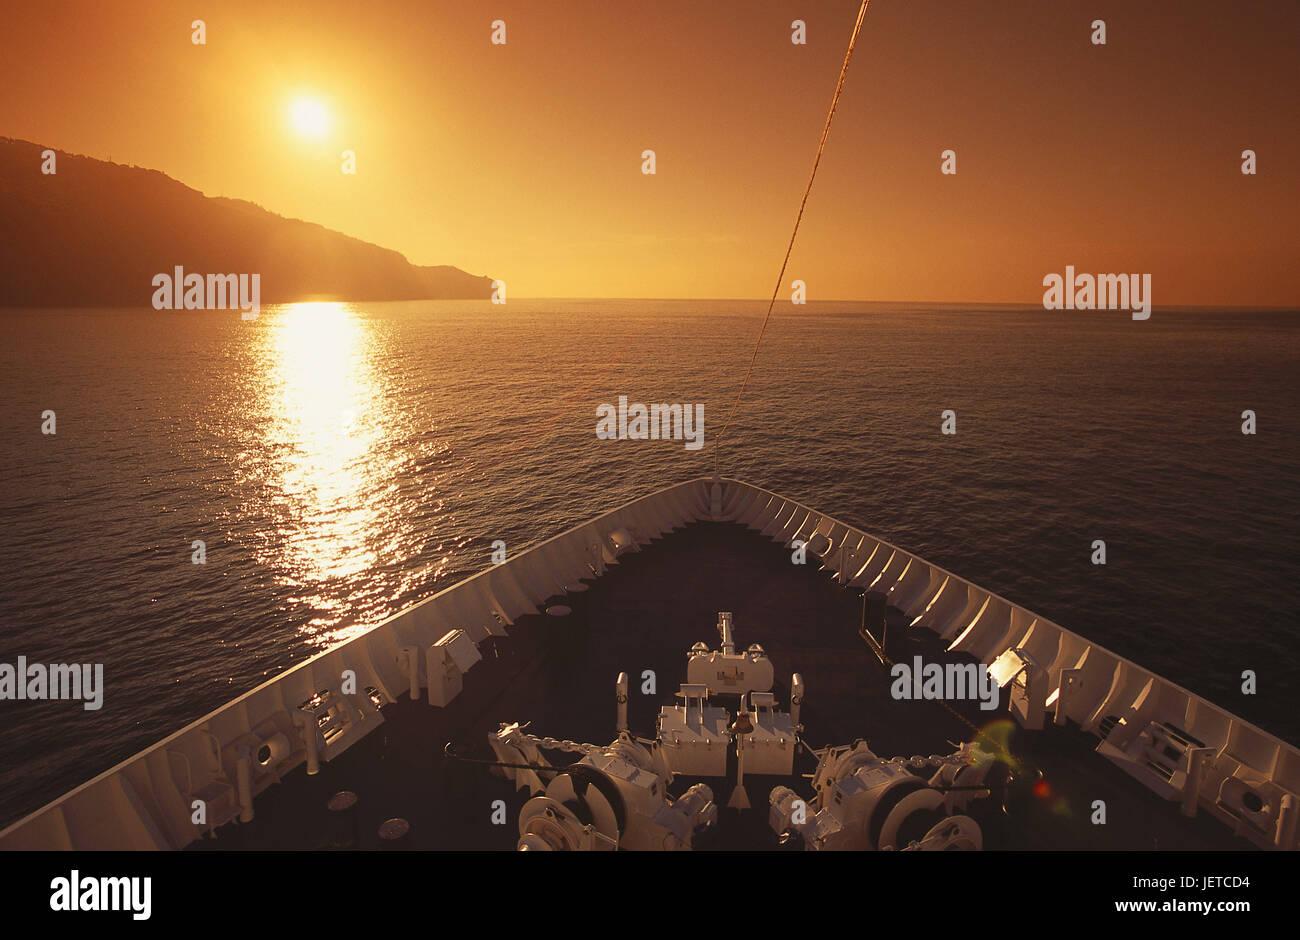 Portugal, Insel Porto Santo, Atlantik, Schiff, Detail, Fehler, Sonnenuntergang, Meer, Schiff Bug, Navigation, Kreuzfahrt, Stockbild